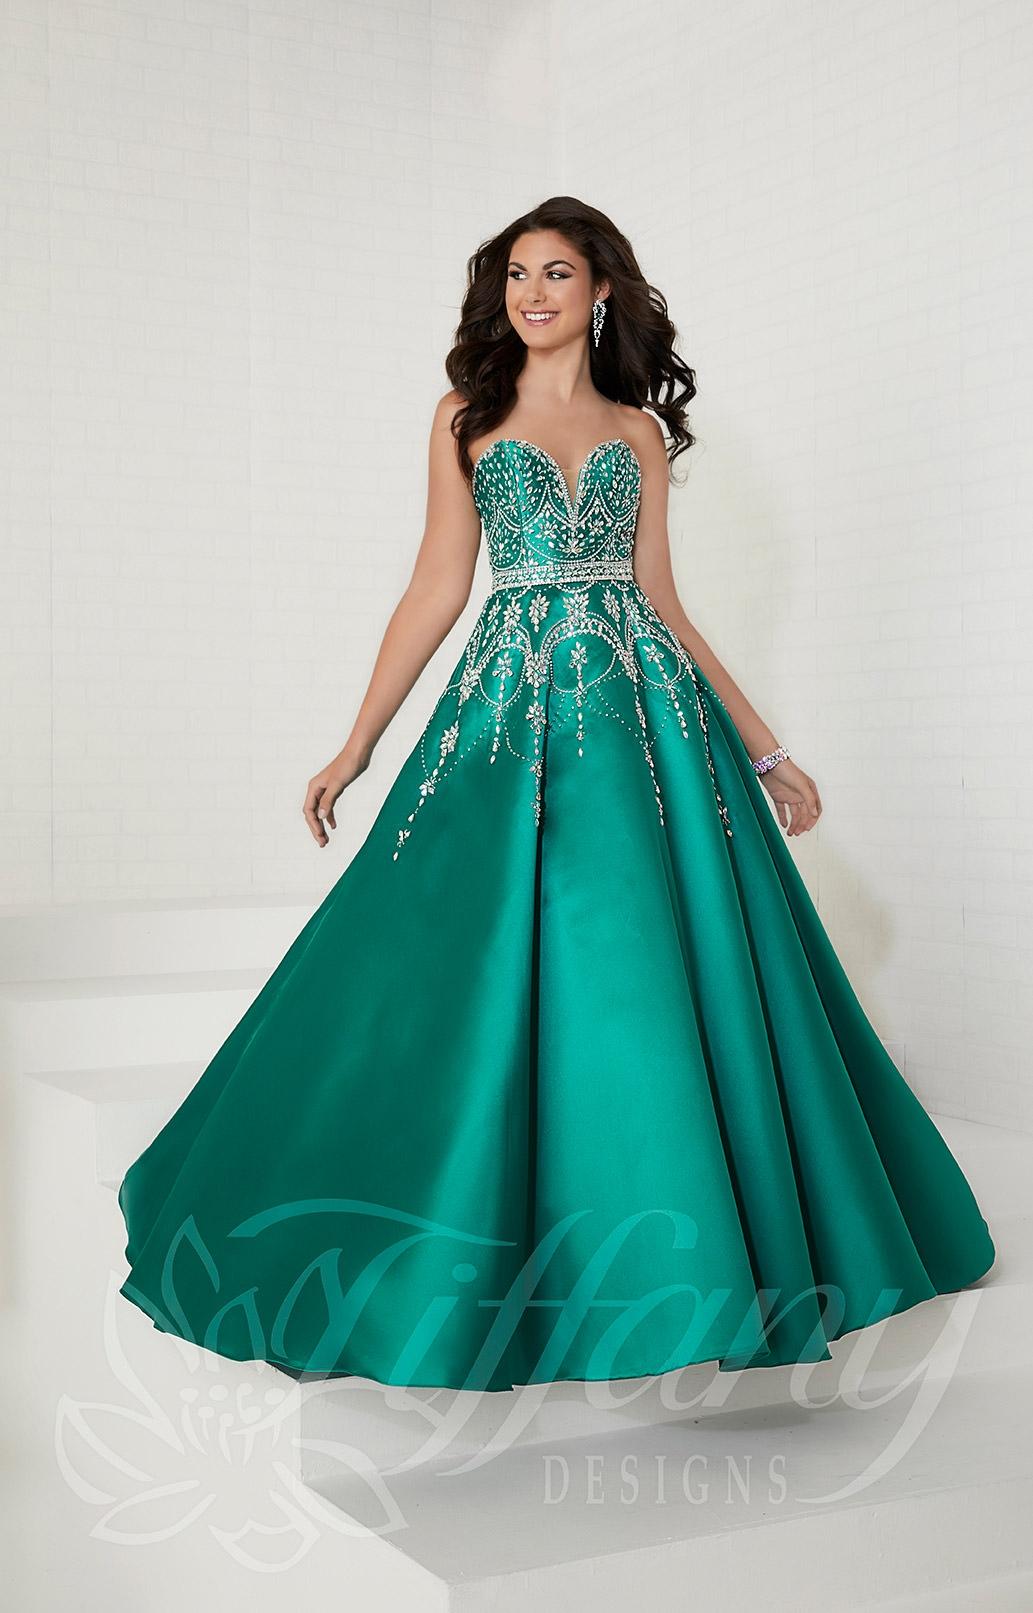 9ff96f462cb8 Tiffany Designs 16266 - Long Strapless Sweetheart Mikado